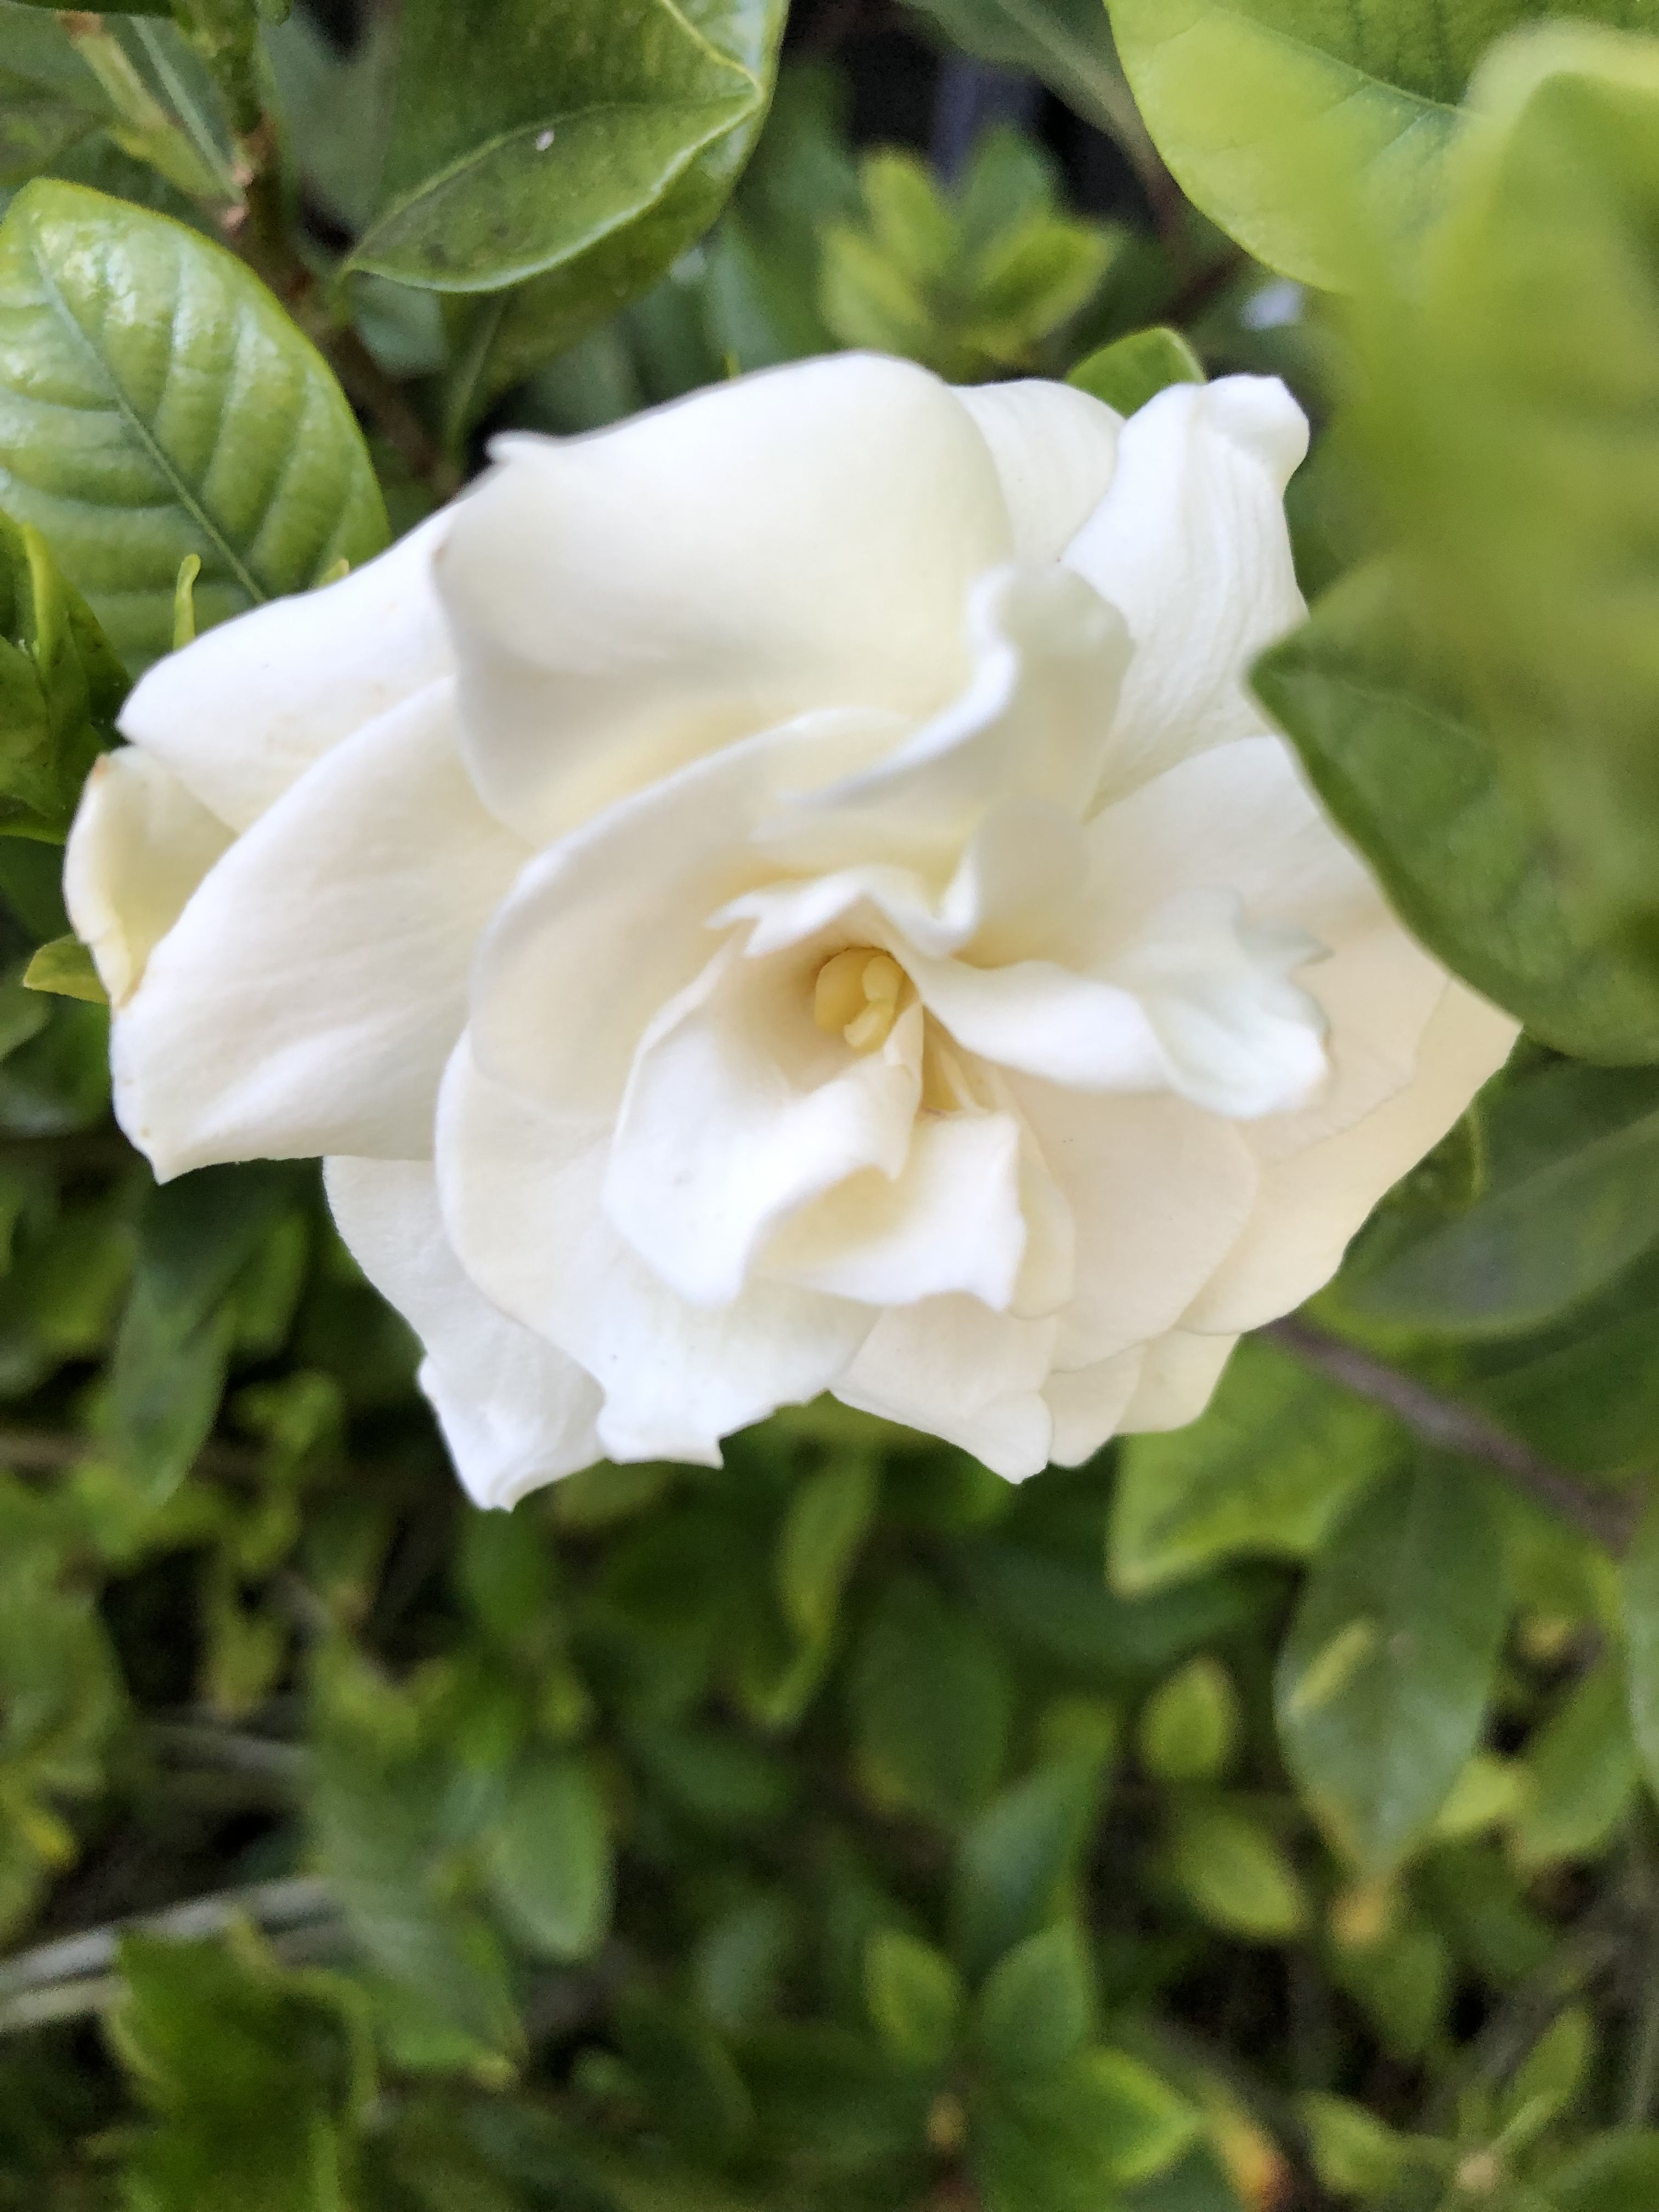 Pin By Vagabond On Sweet Gardenia In 2020 Sweet Gardenia Flowers Gardenia